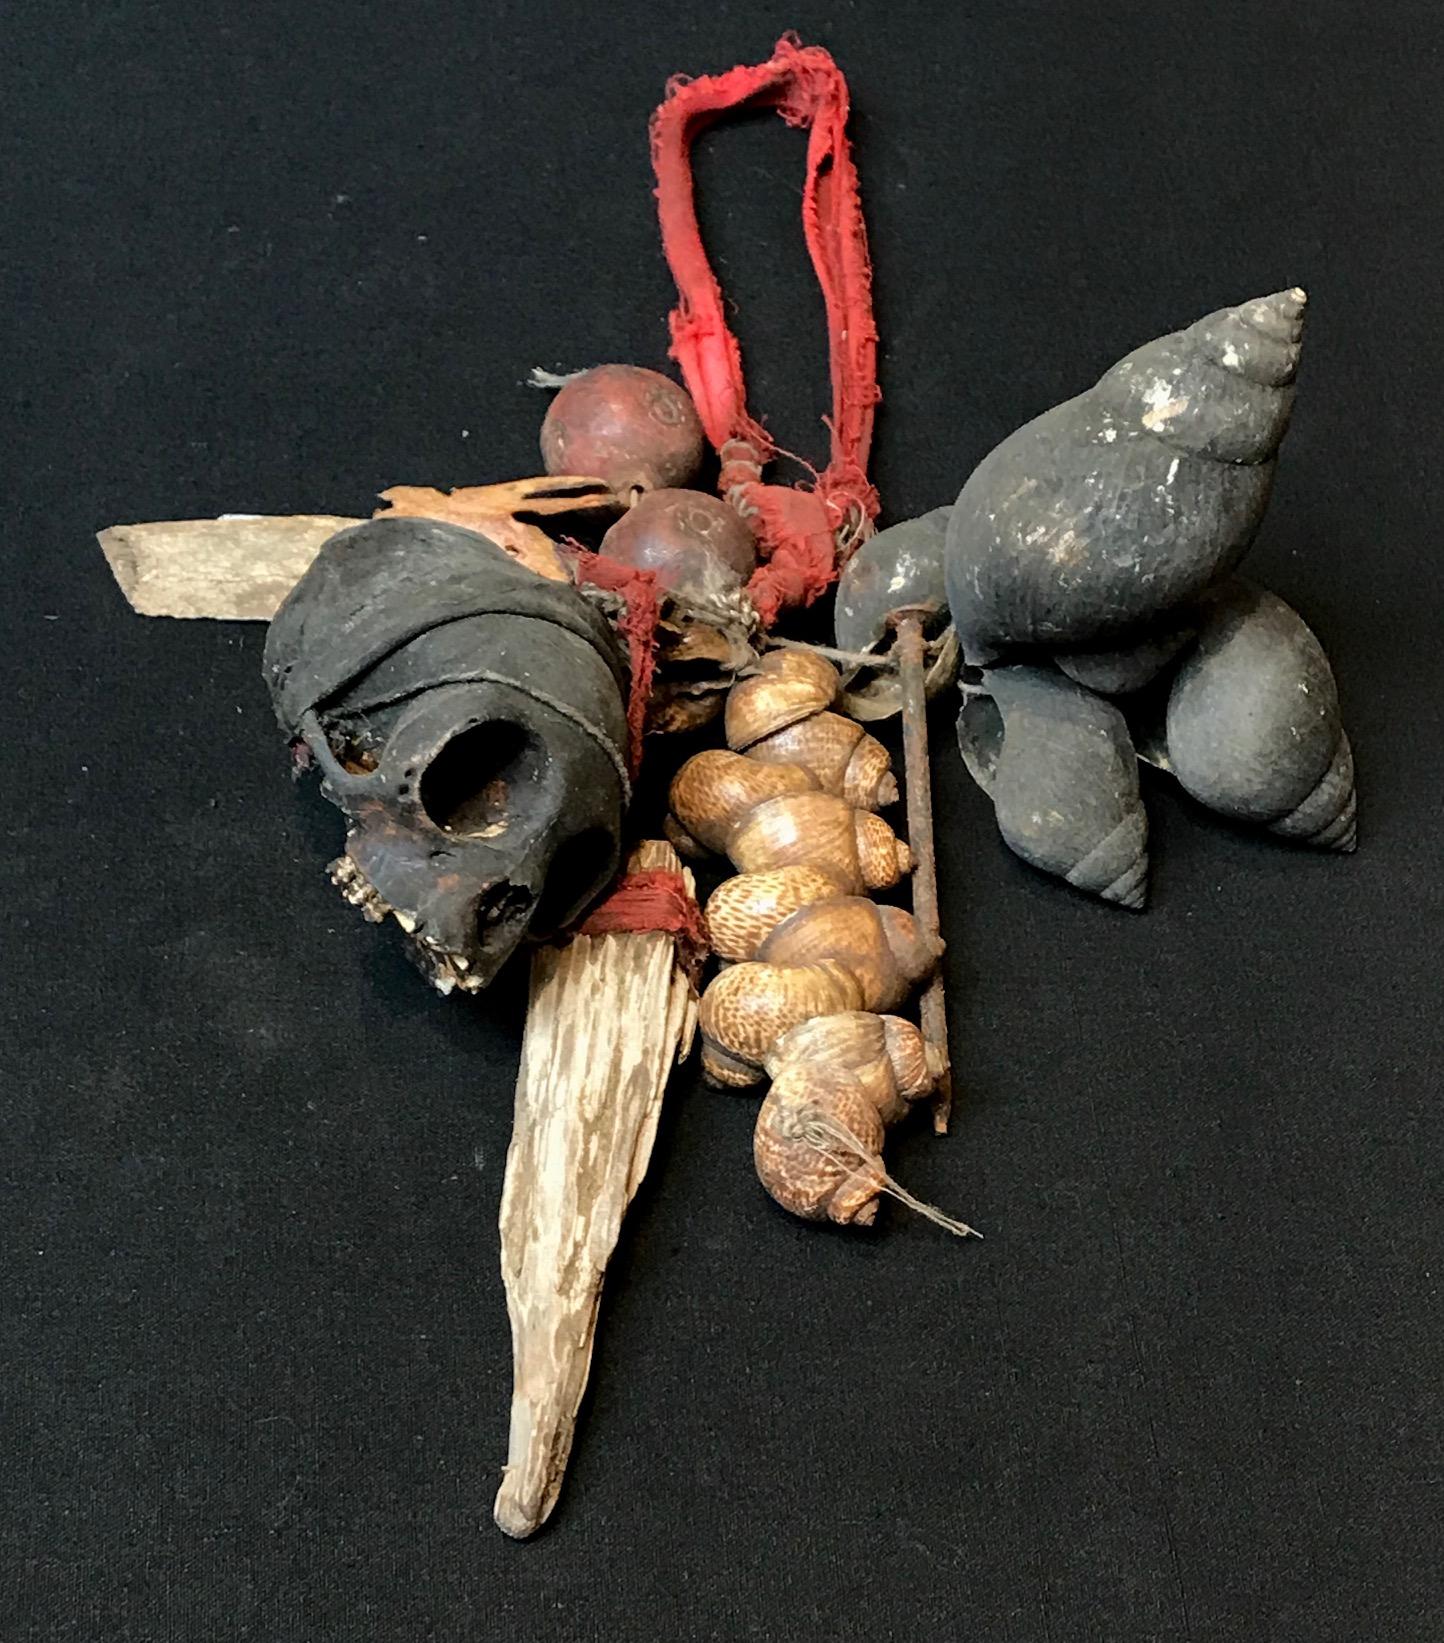 "Shaman's ritual dance rattle, Indonesia, Borneo, Dayak tribe, early 20th c., Monkey skull, sea shells, metal nail, ceramic beads, glass bead, Shaken to scare away evil or harmful spirits, 12"" x 7"""